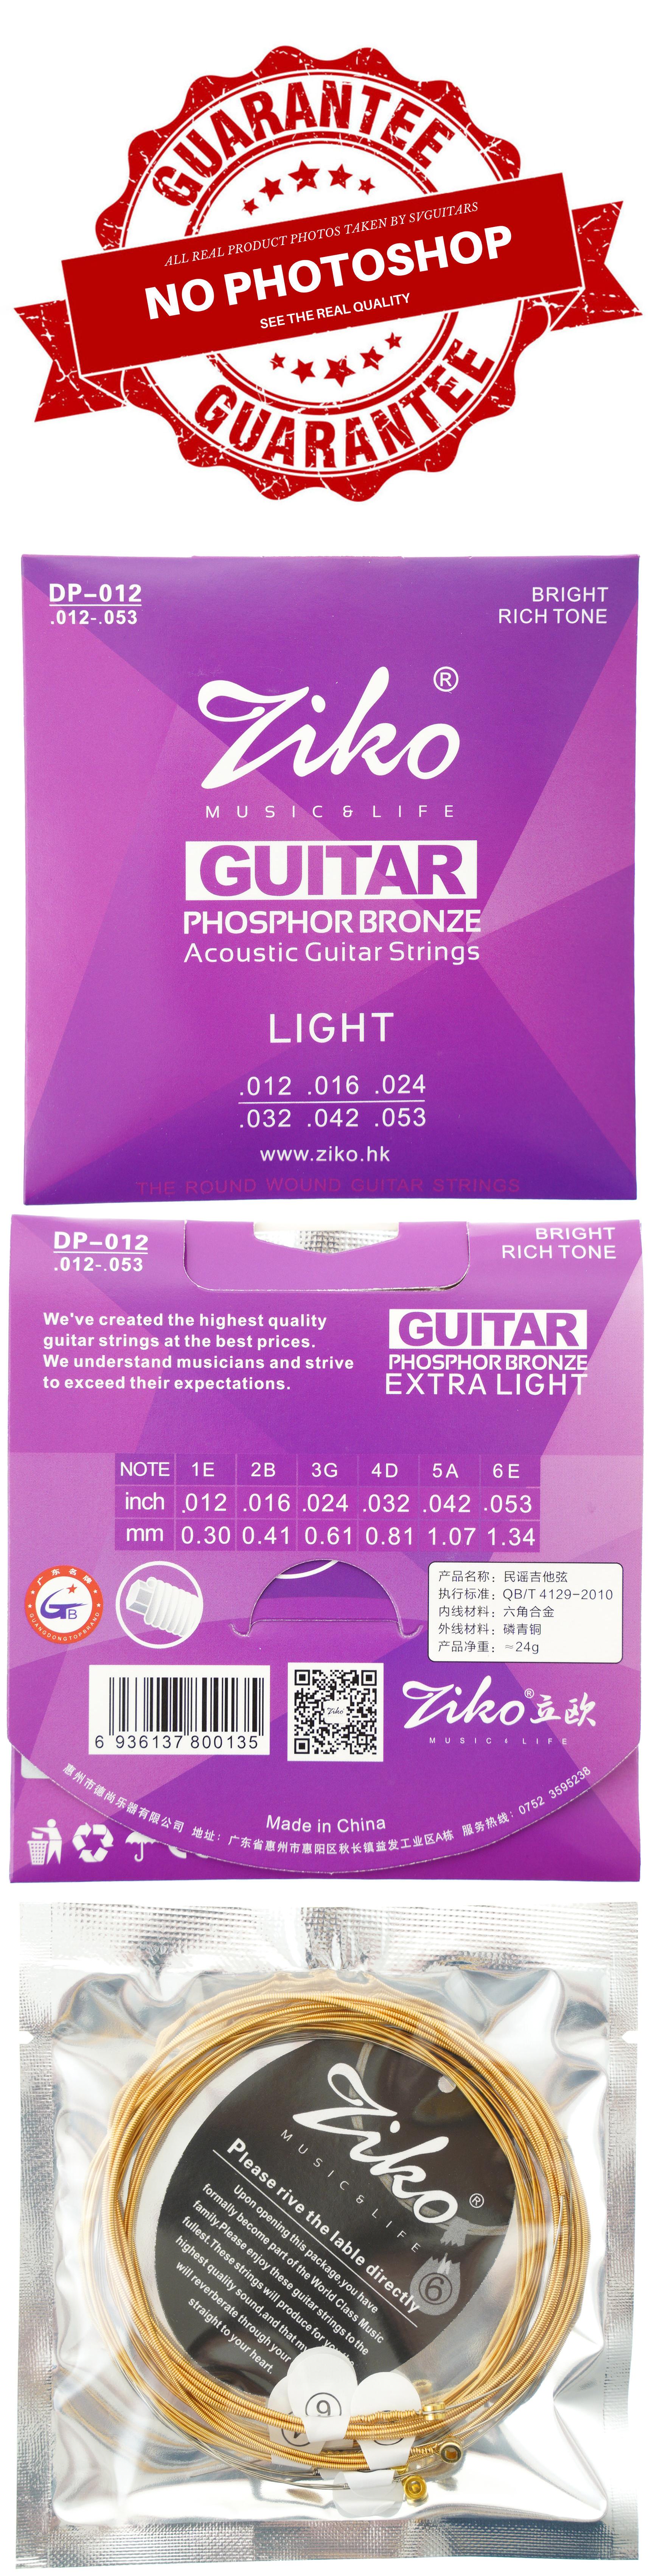 ziko-dp-012-12-53-phosphor-bronze-acoustic-guitar-strings-content.jpg